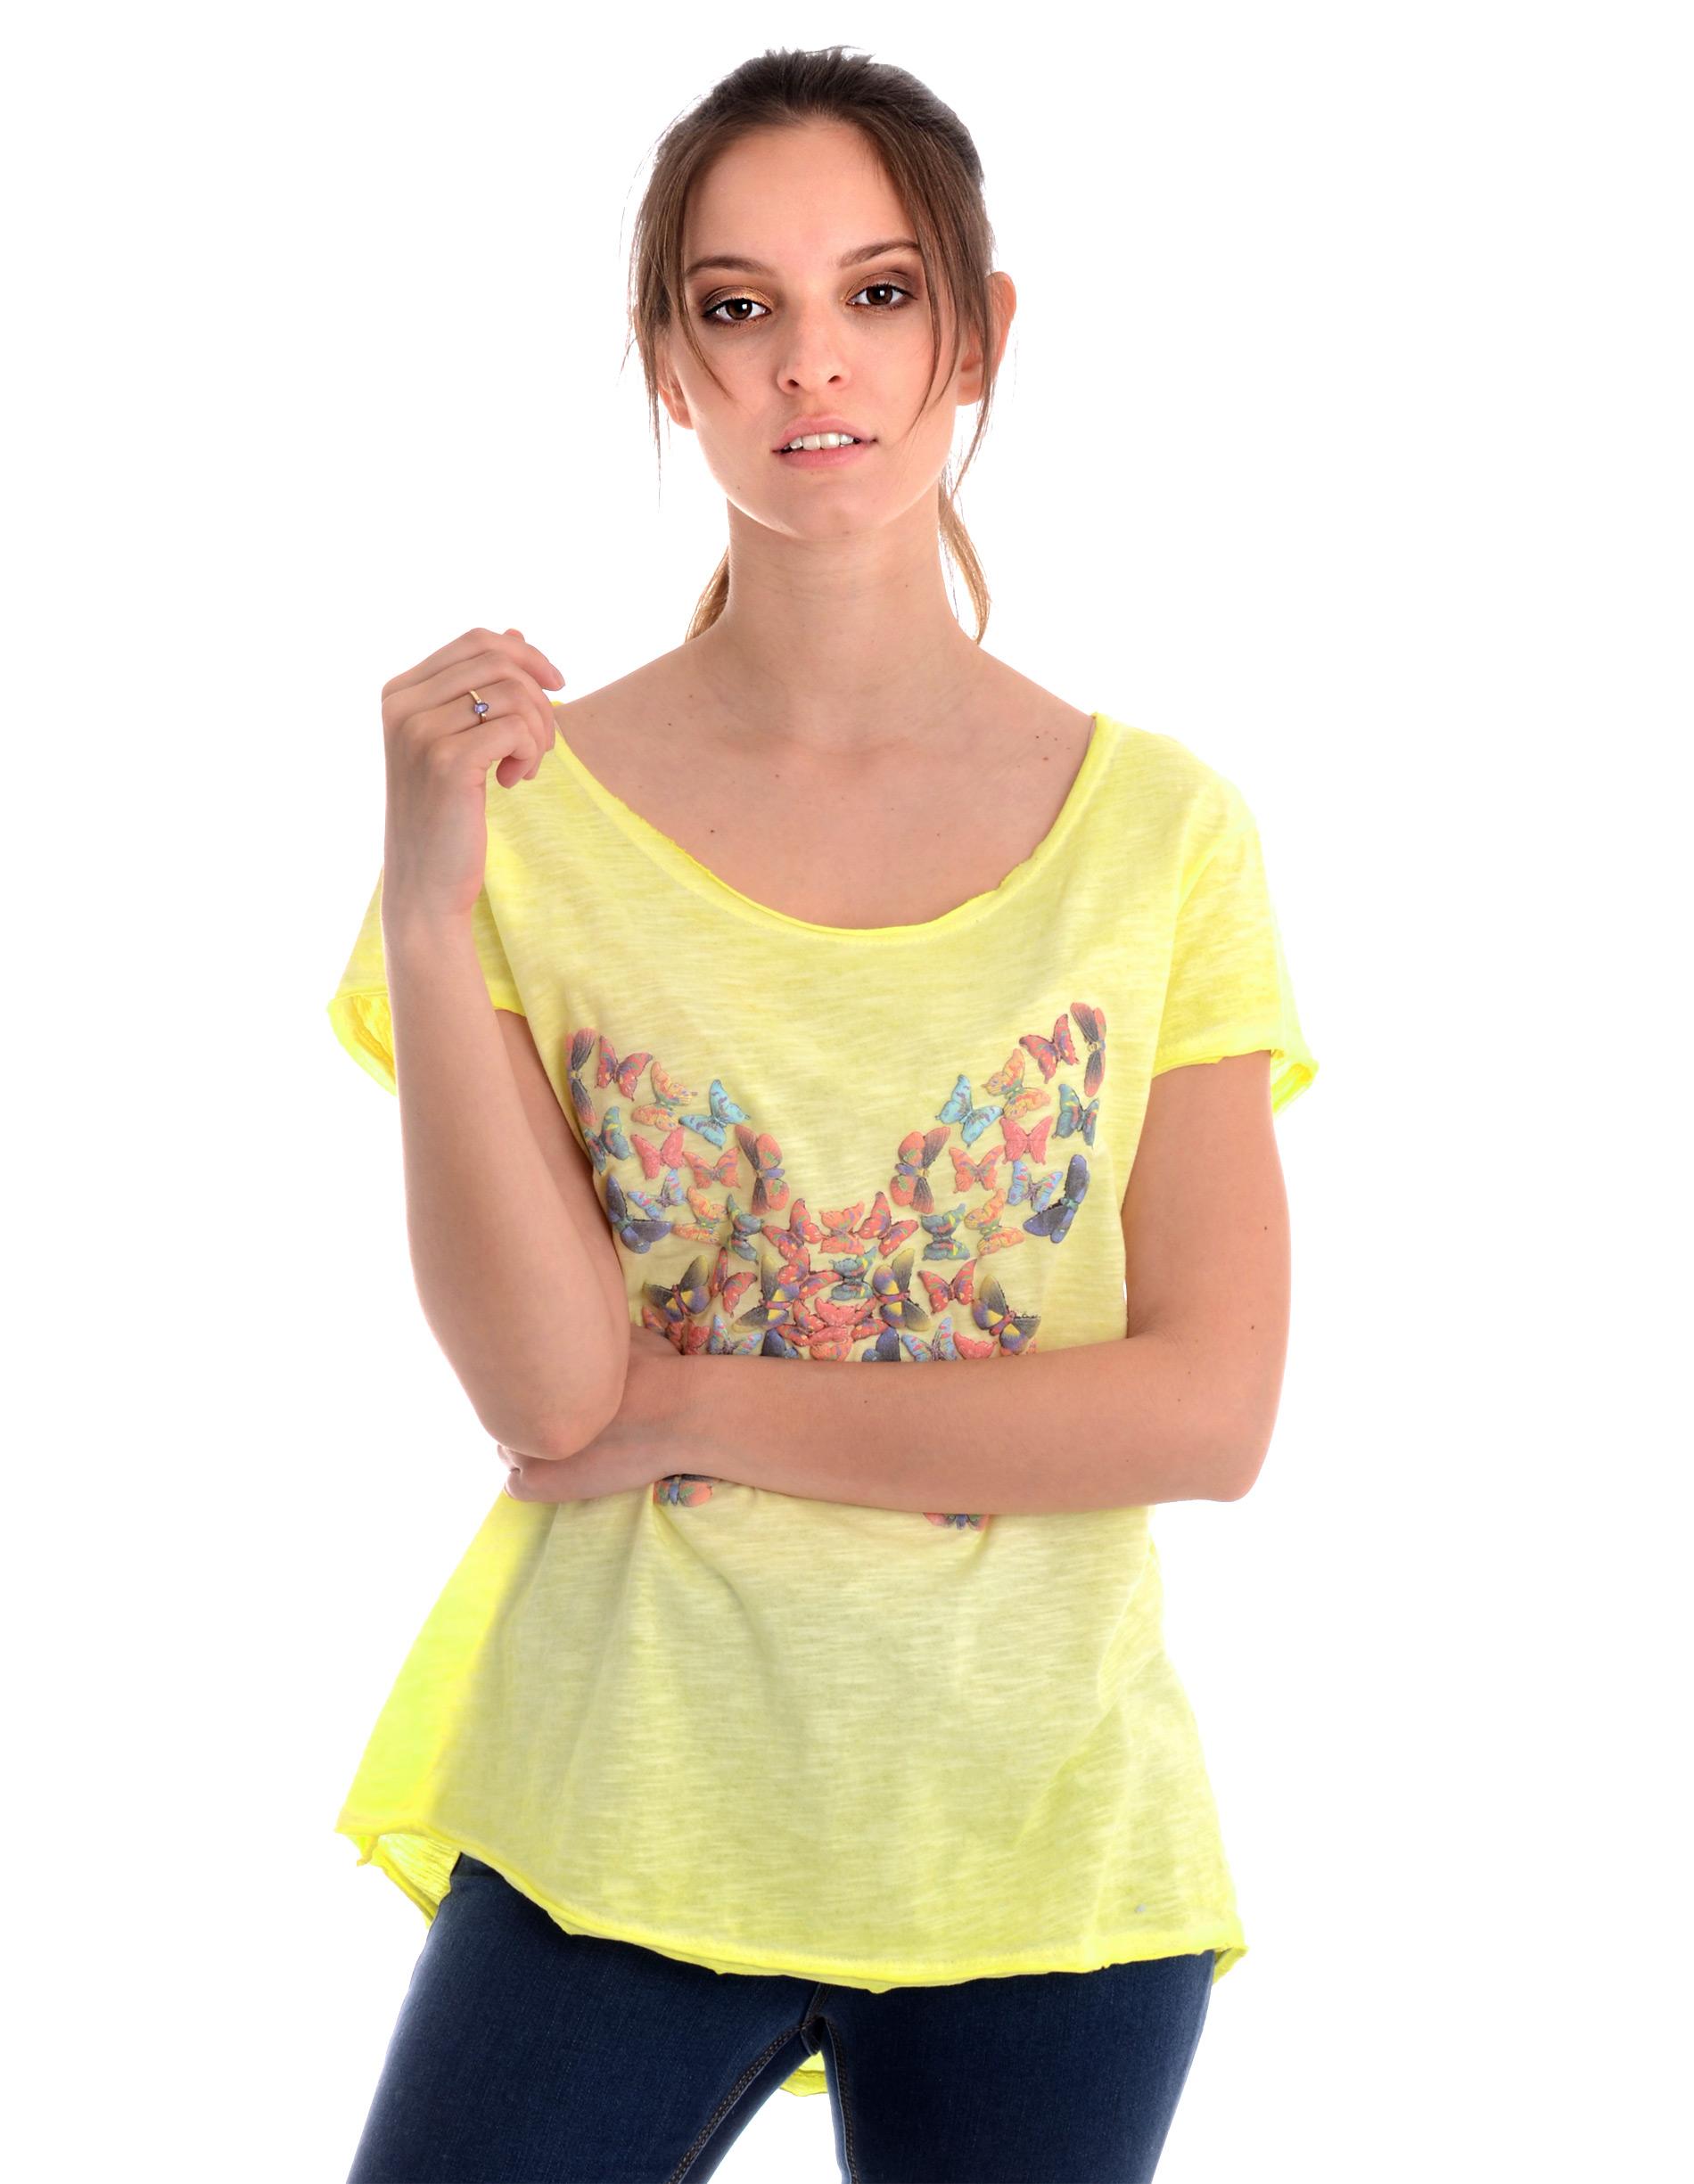 Bluzka - t-shirt - 62-1624 GIALL - Unisono